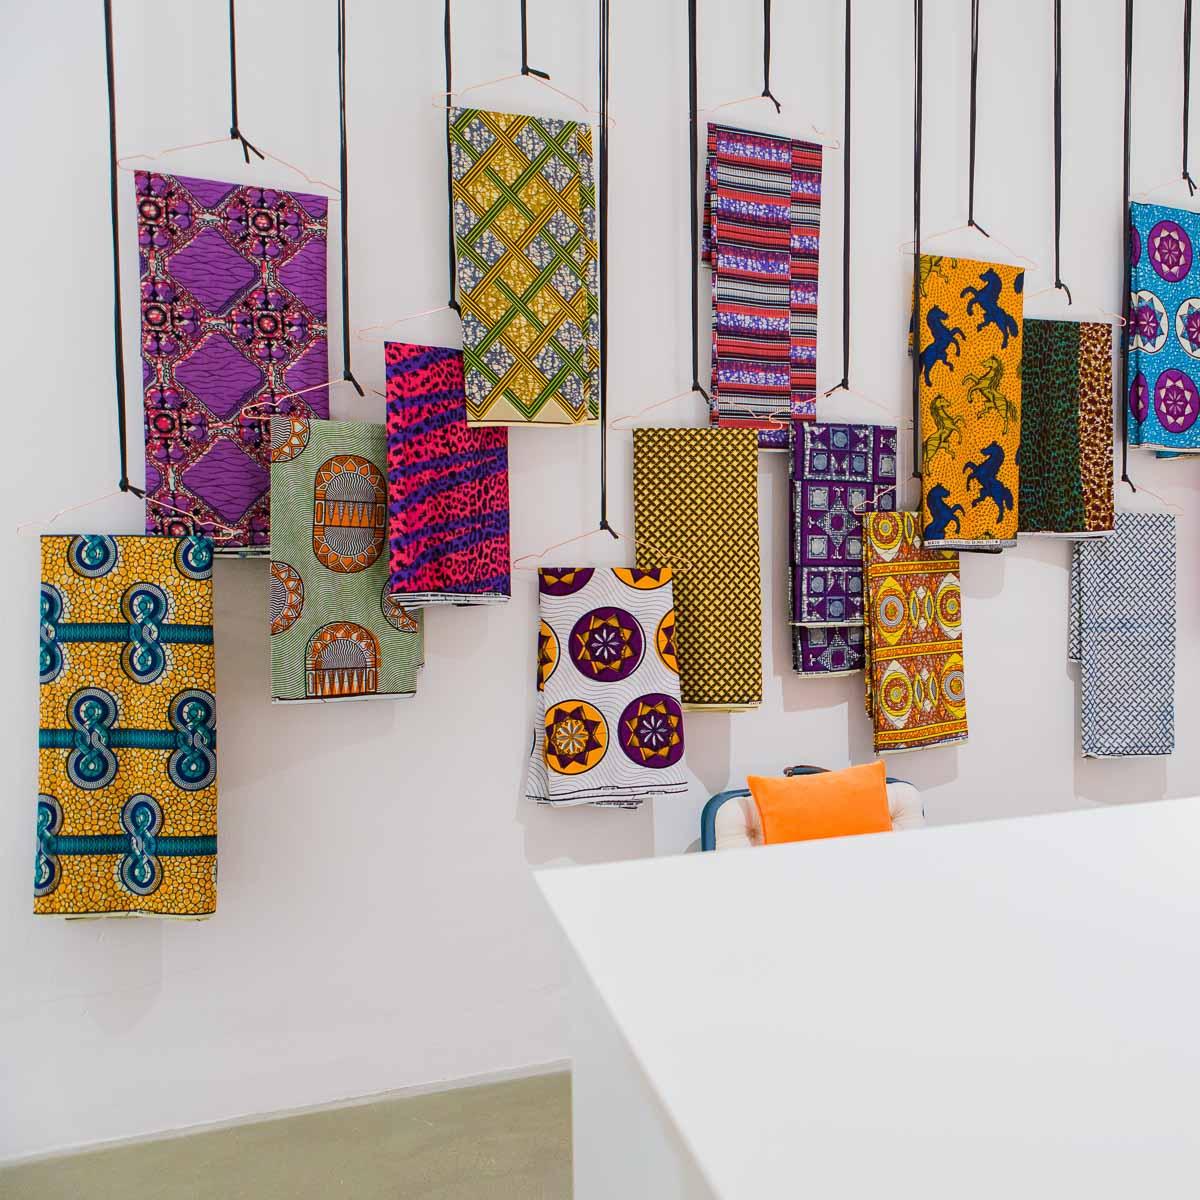 Habari Design Store Wien-5